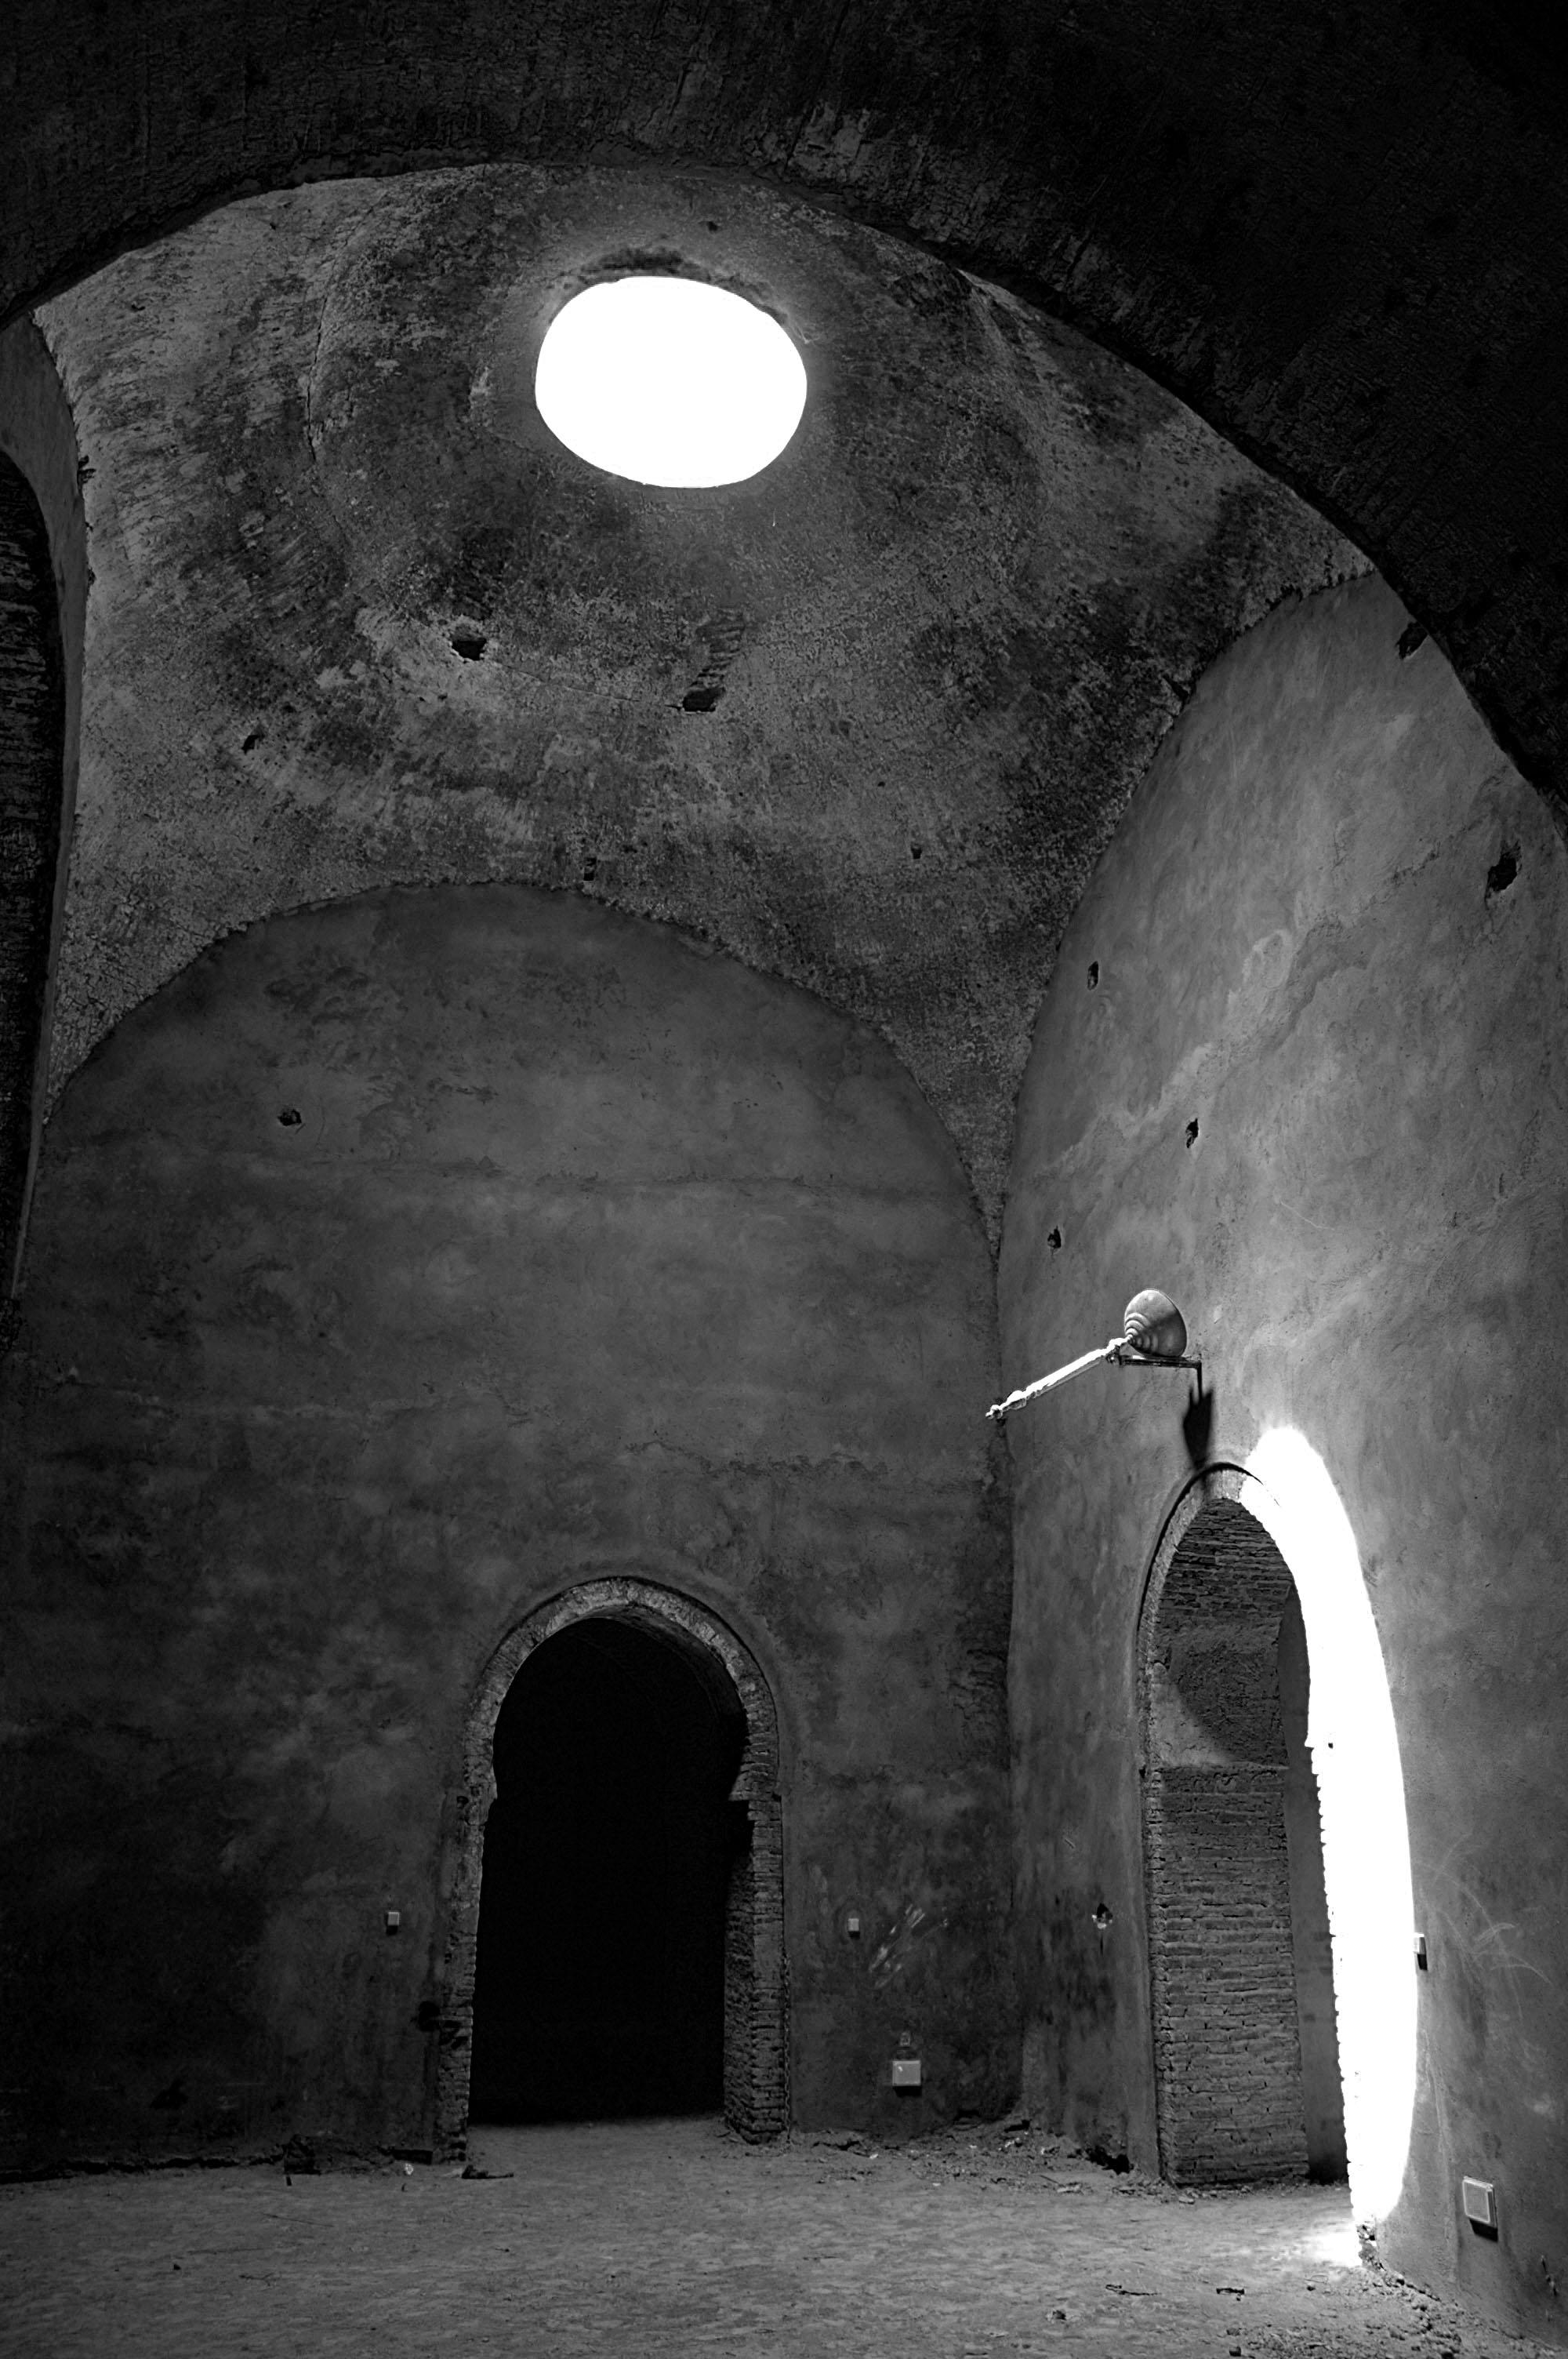 Maroc nord Meknes greniers